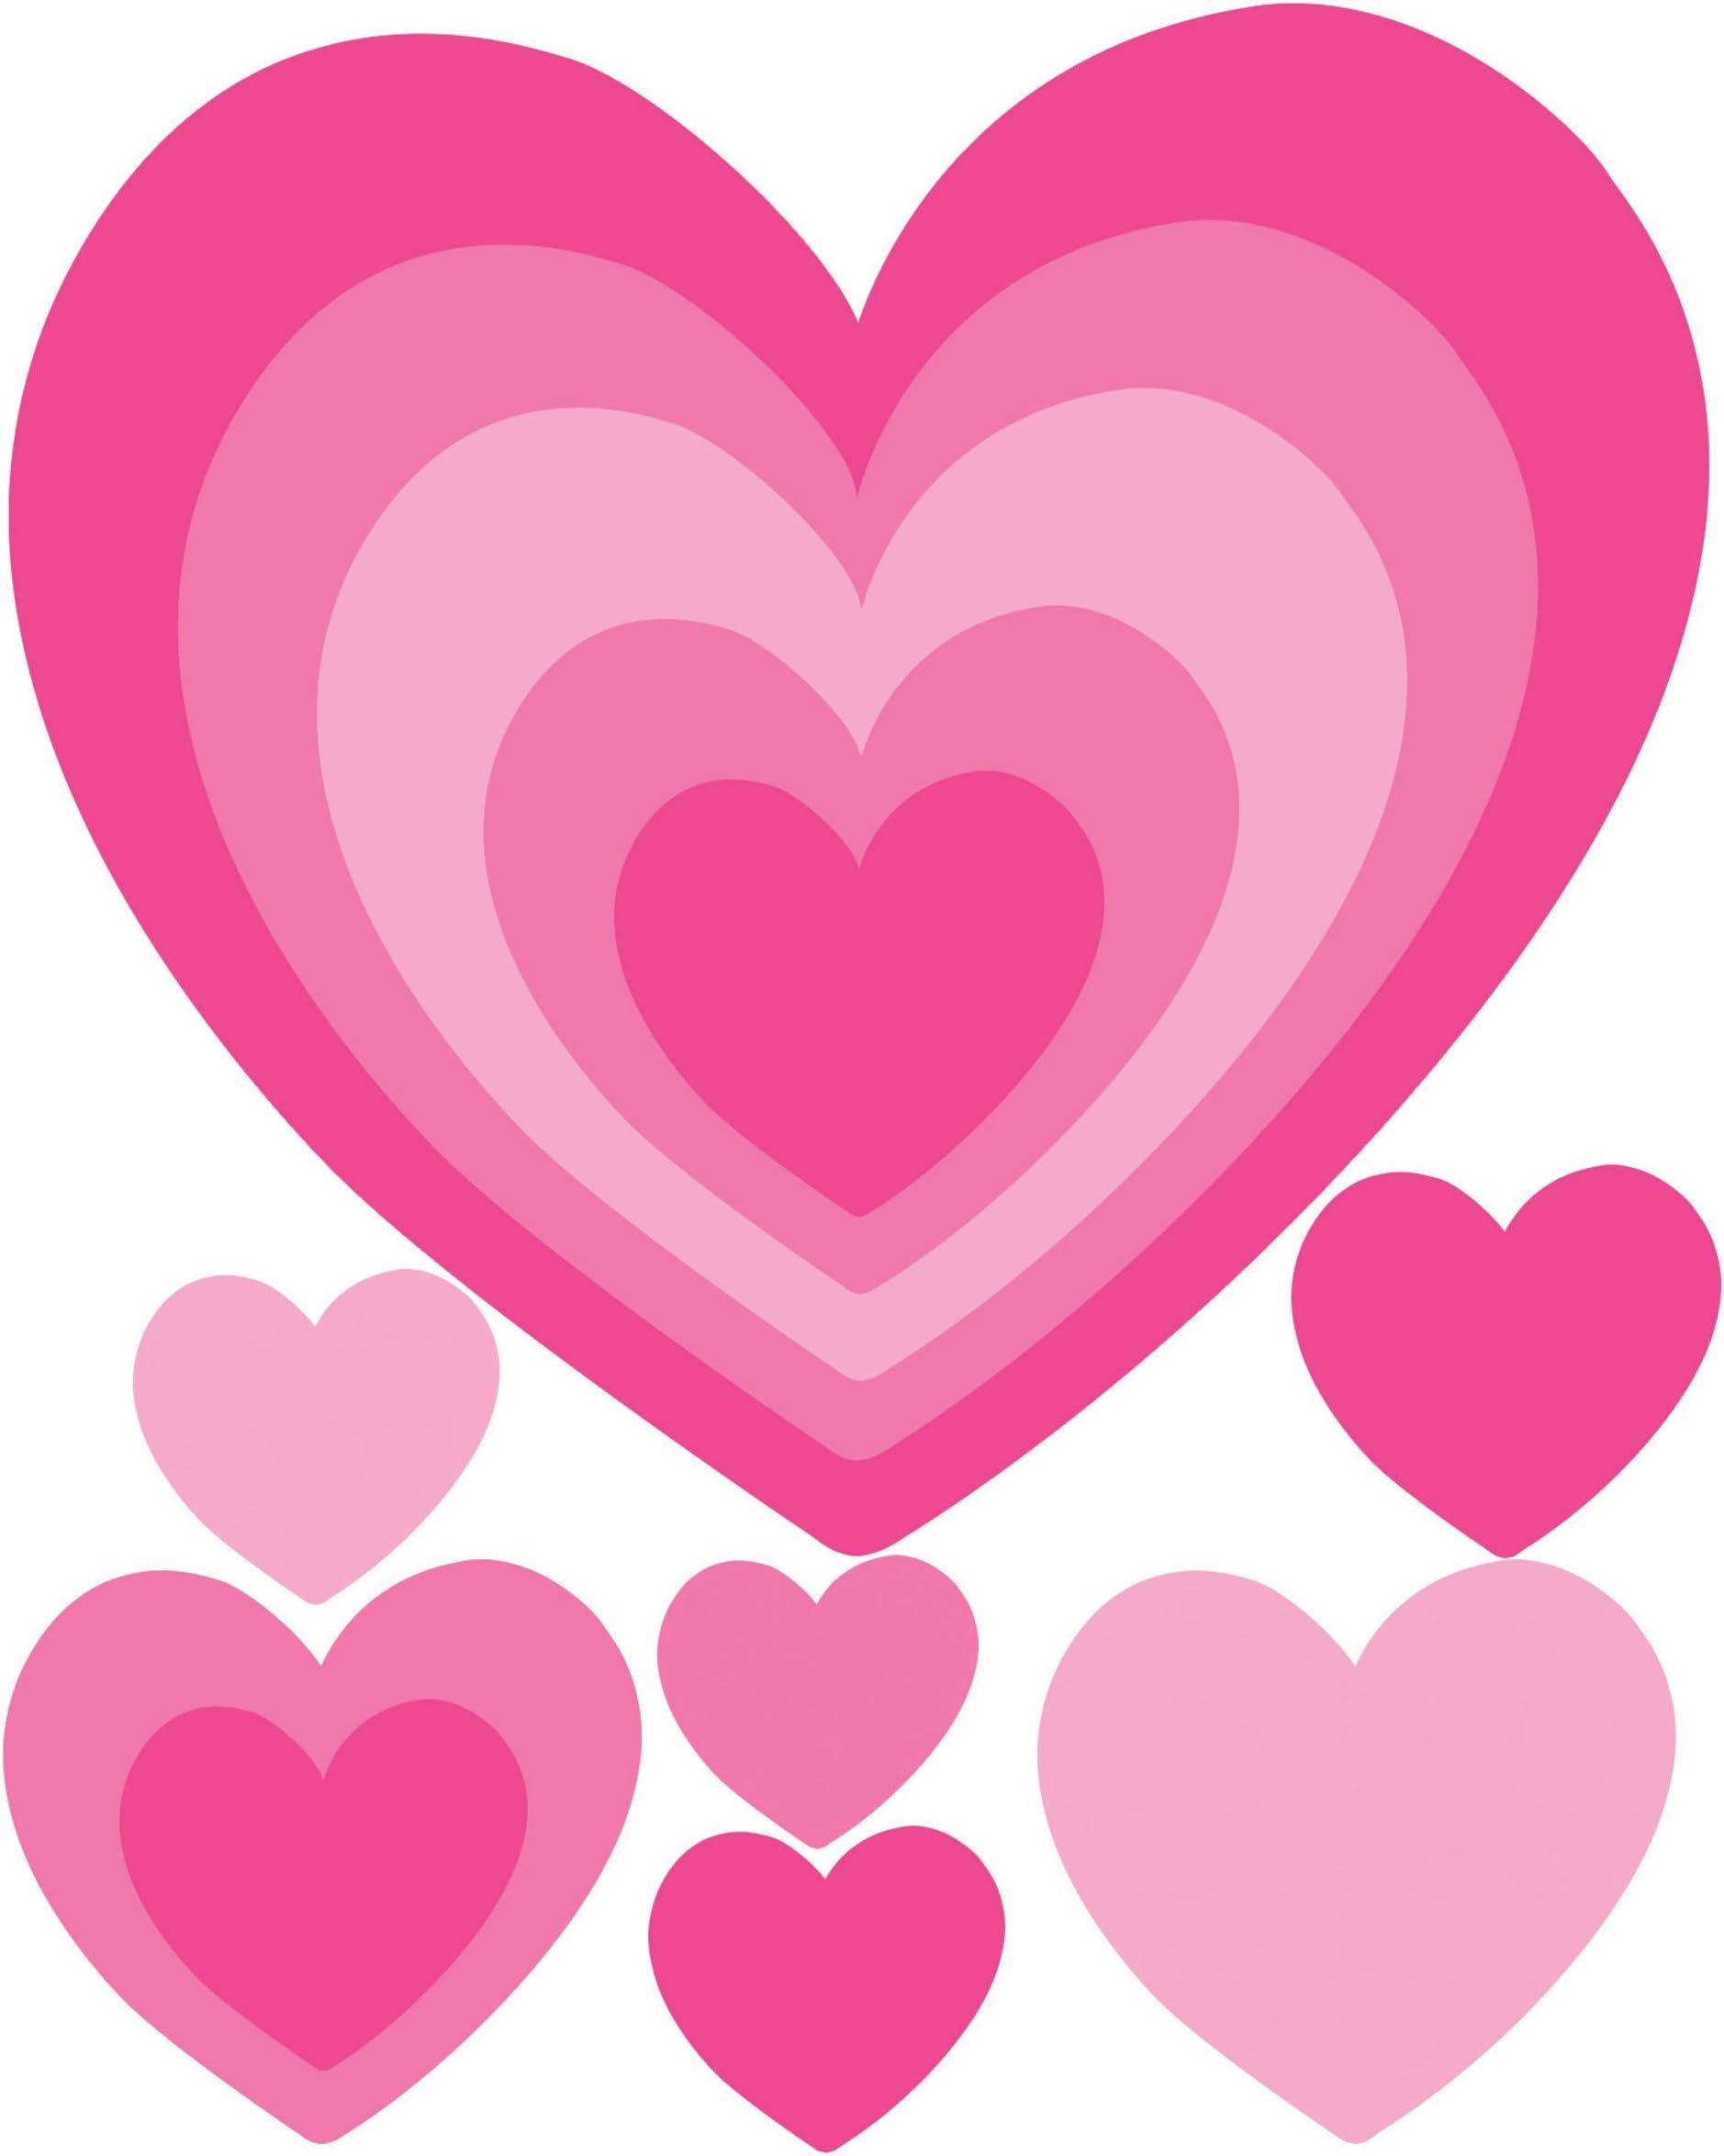 Wall Sticker Vinyl Heart Stickers Peel And Stick Hearts Vinyl Decal 96 Two colors Hearts Wall Decal Hearts Decal Nursery Heart Decal